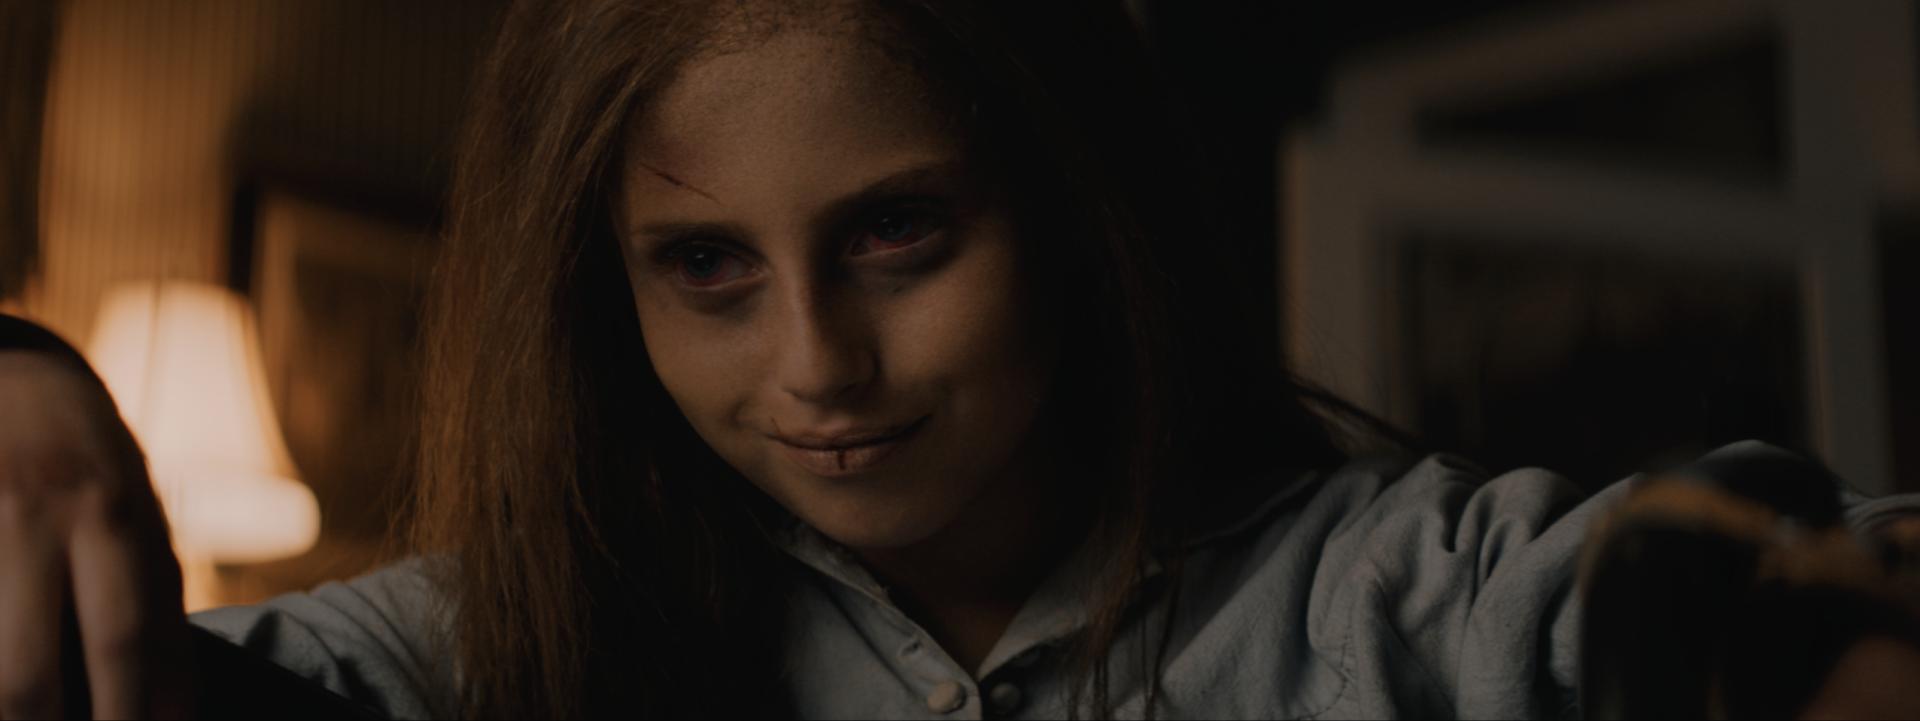 El Habitante / Ahol a gonosz lakik (2017)